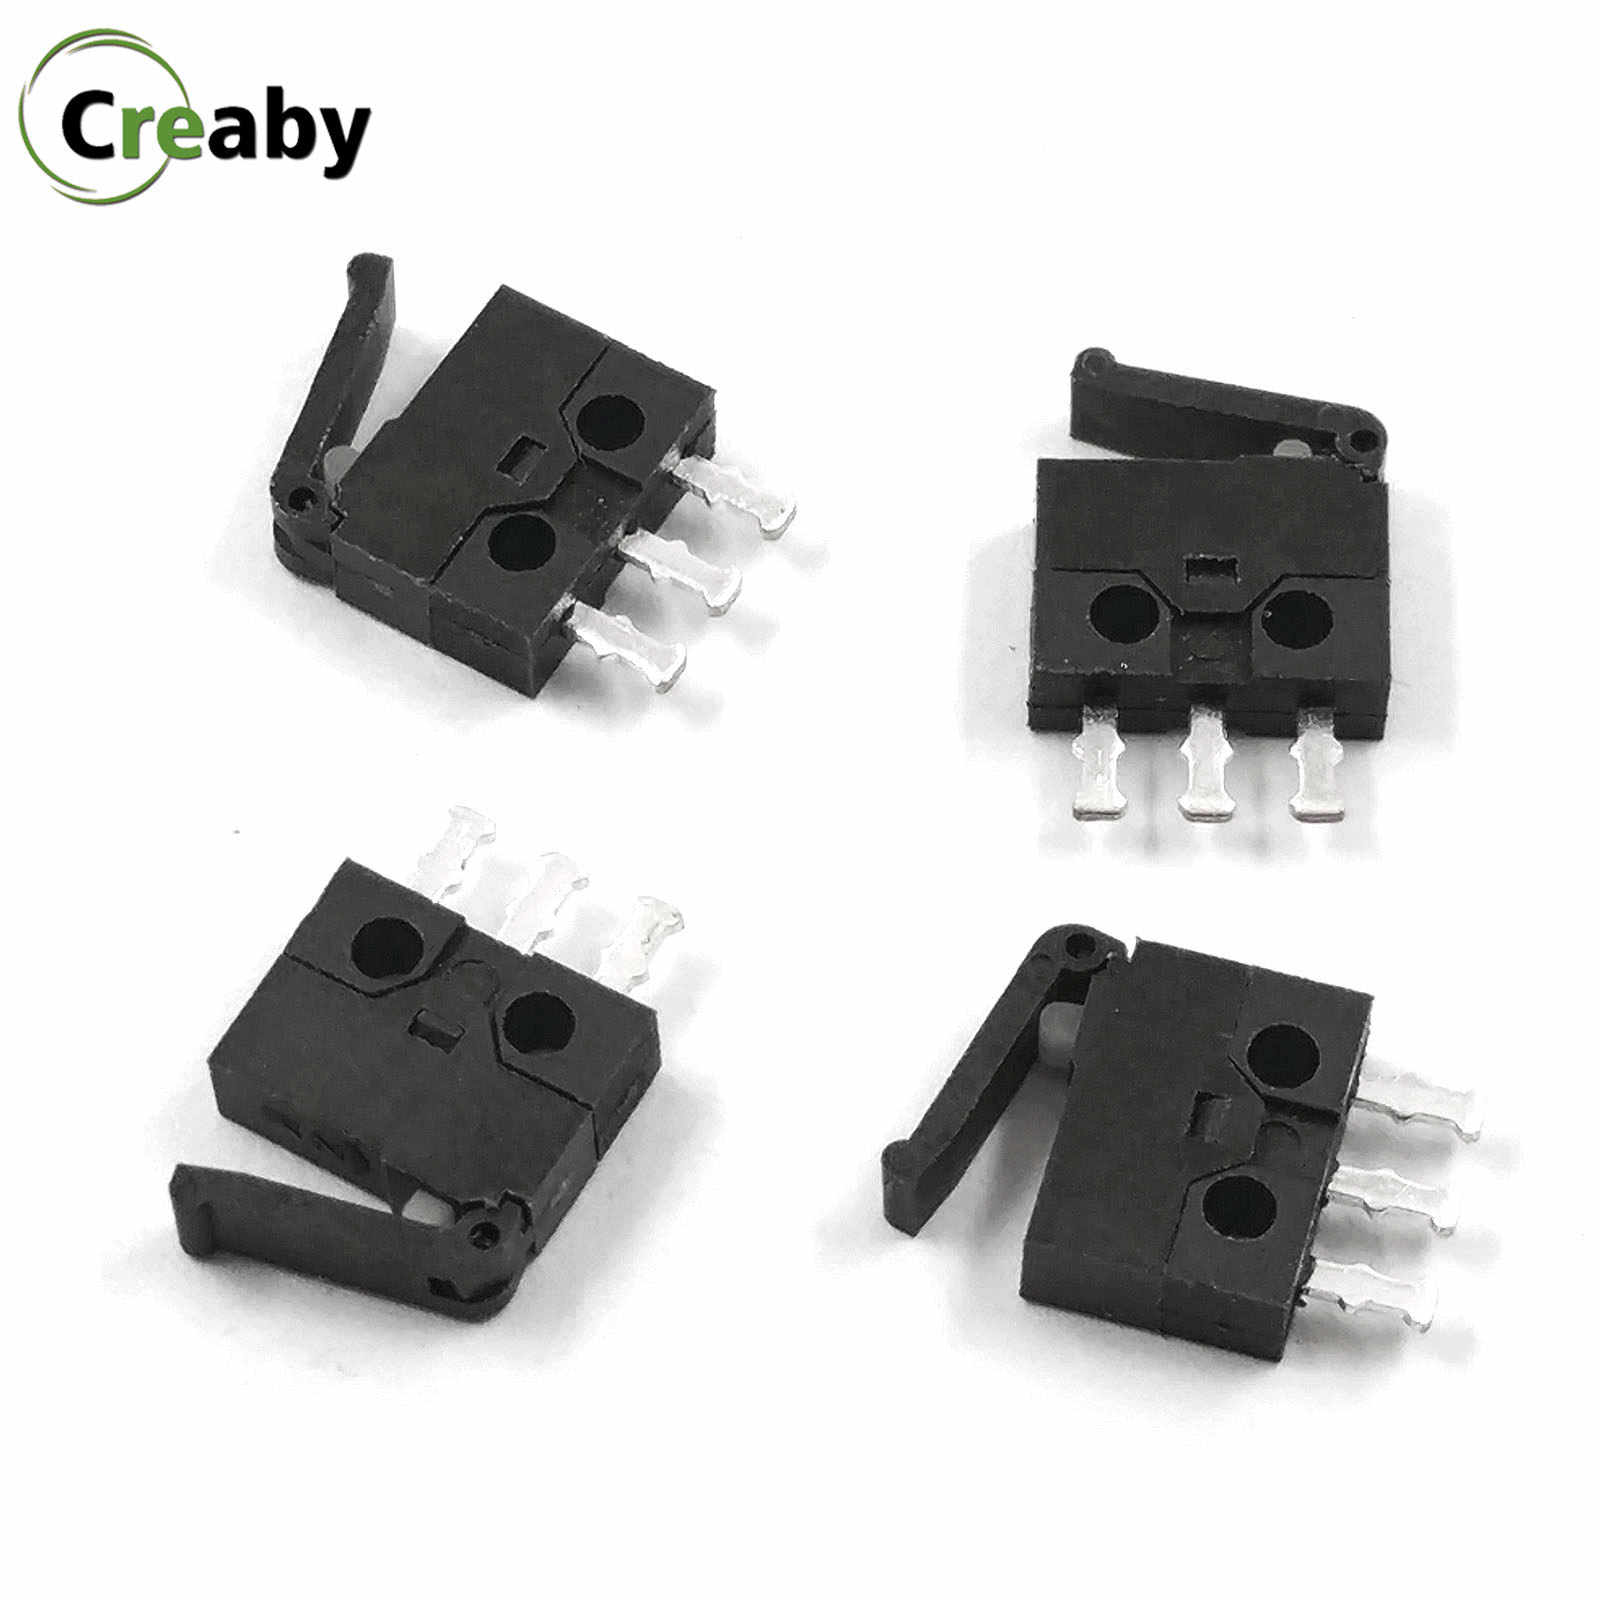 10 Pcs/lot Mini Micro Switch Kamera Reset Switch Deteksi Batas Stroke 3 Pin Sesuai Switch untuk Peralatan Digital KFC-V-307